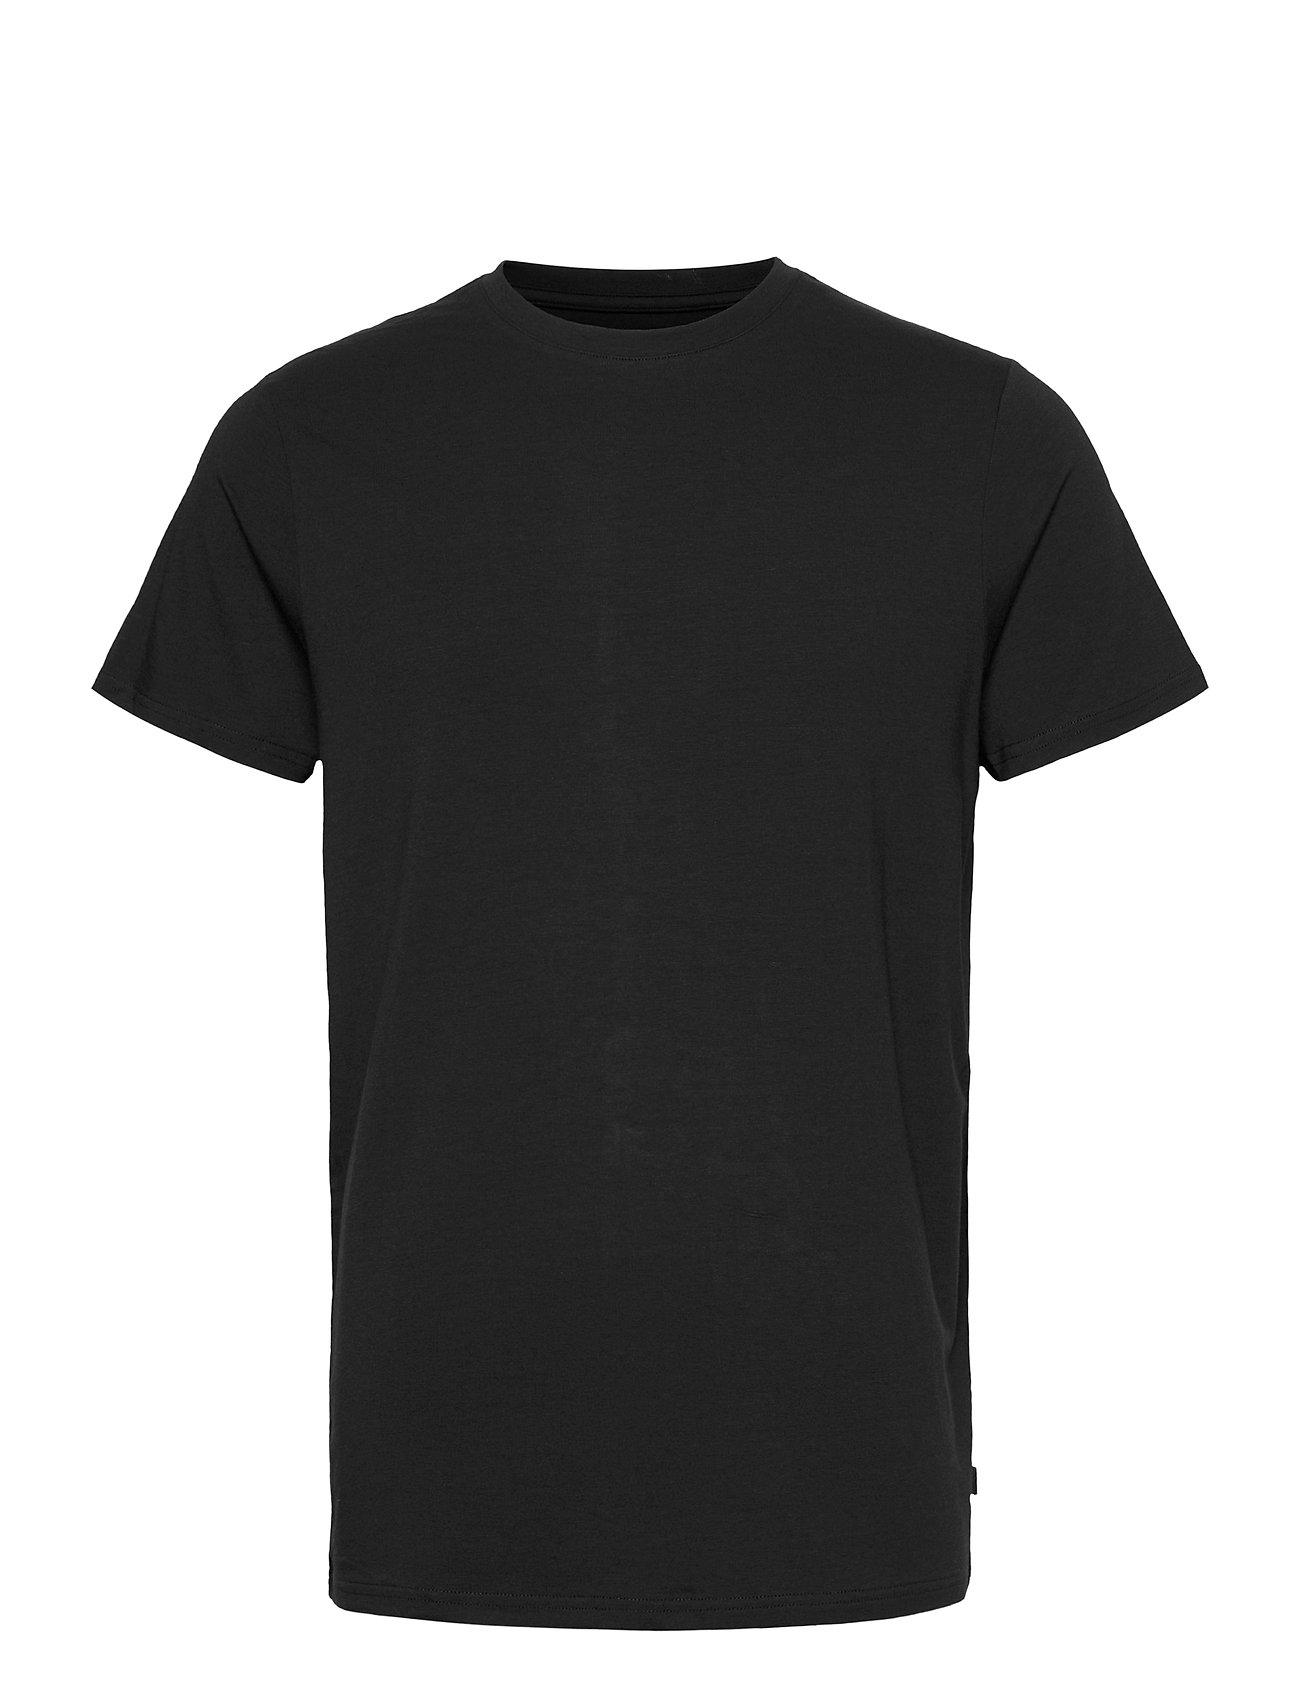 Image of Bamboo R-Neck Tee T-shirt Sort Resteröds (3455507505)